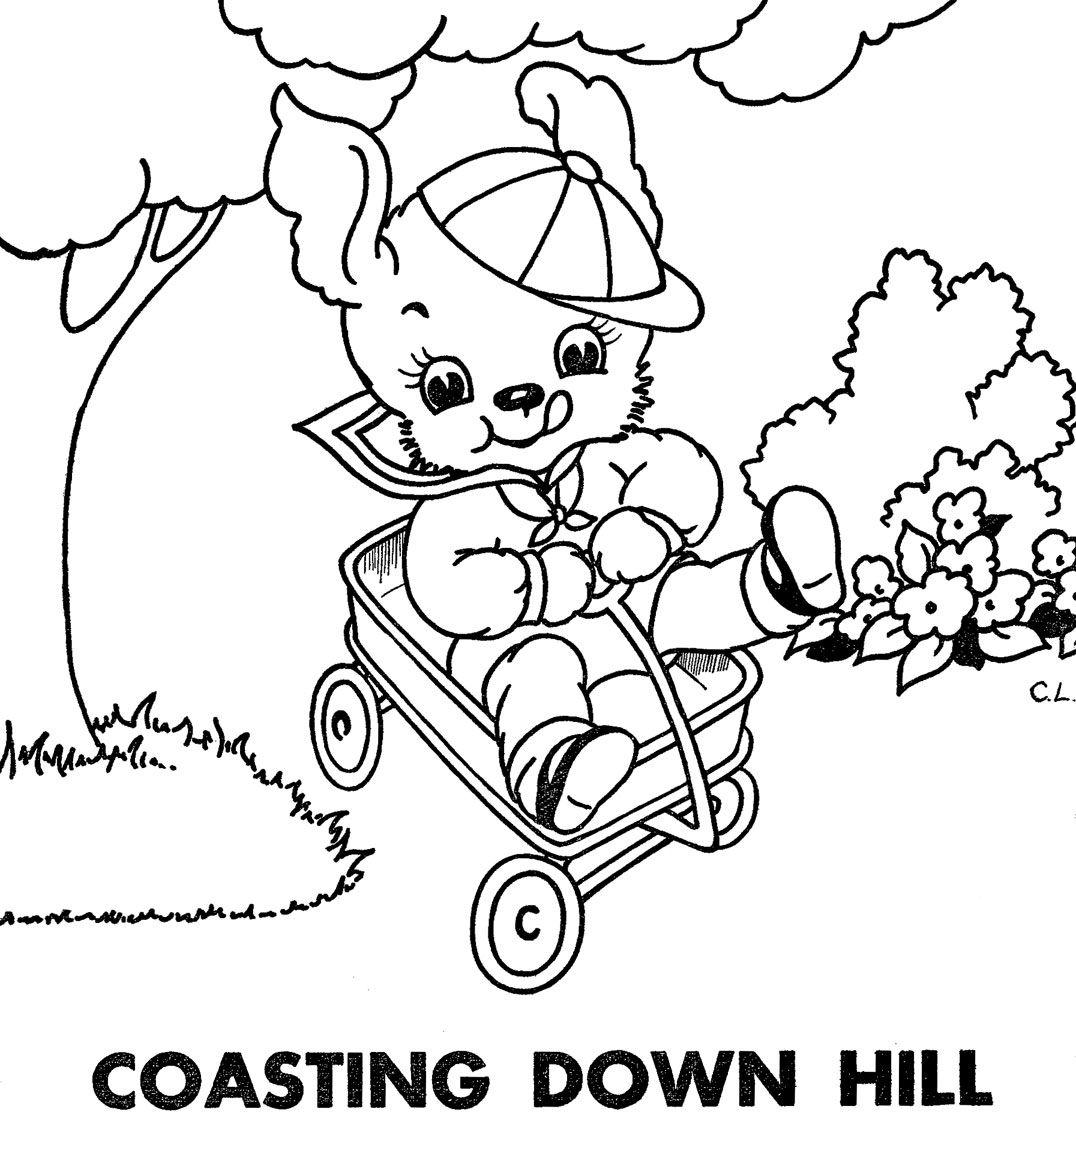 coastingdownhill.jpg 1,076×1,169 pixels | Embroidery | Pinterest